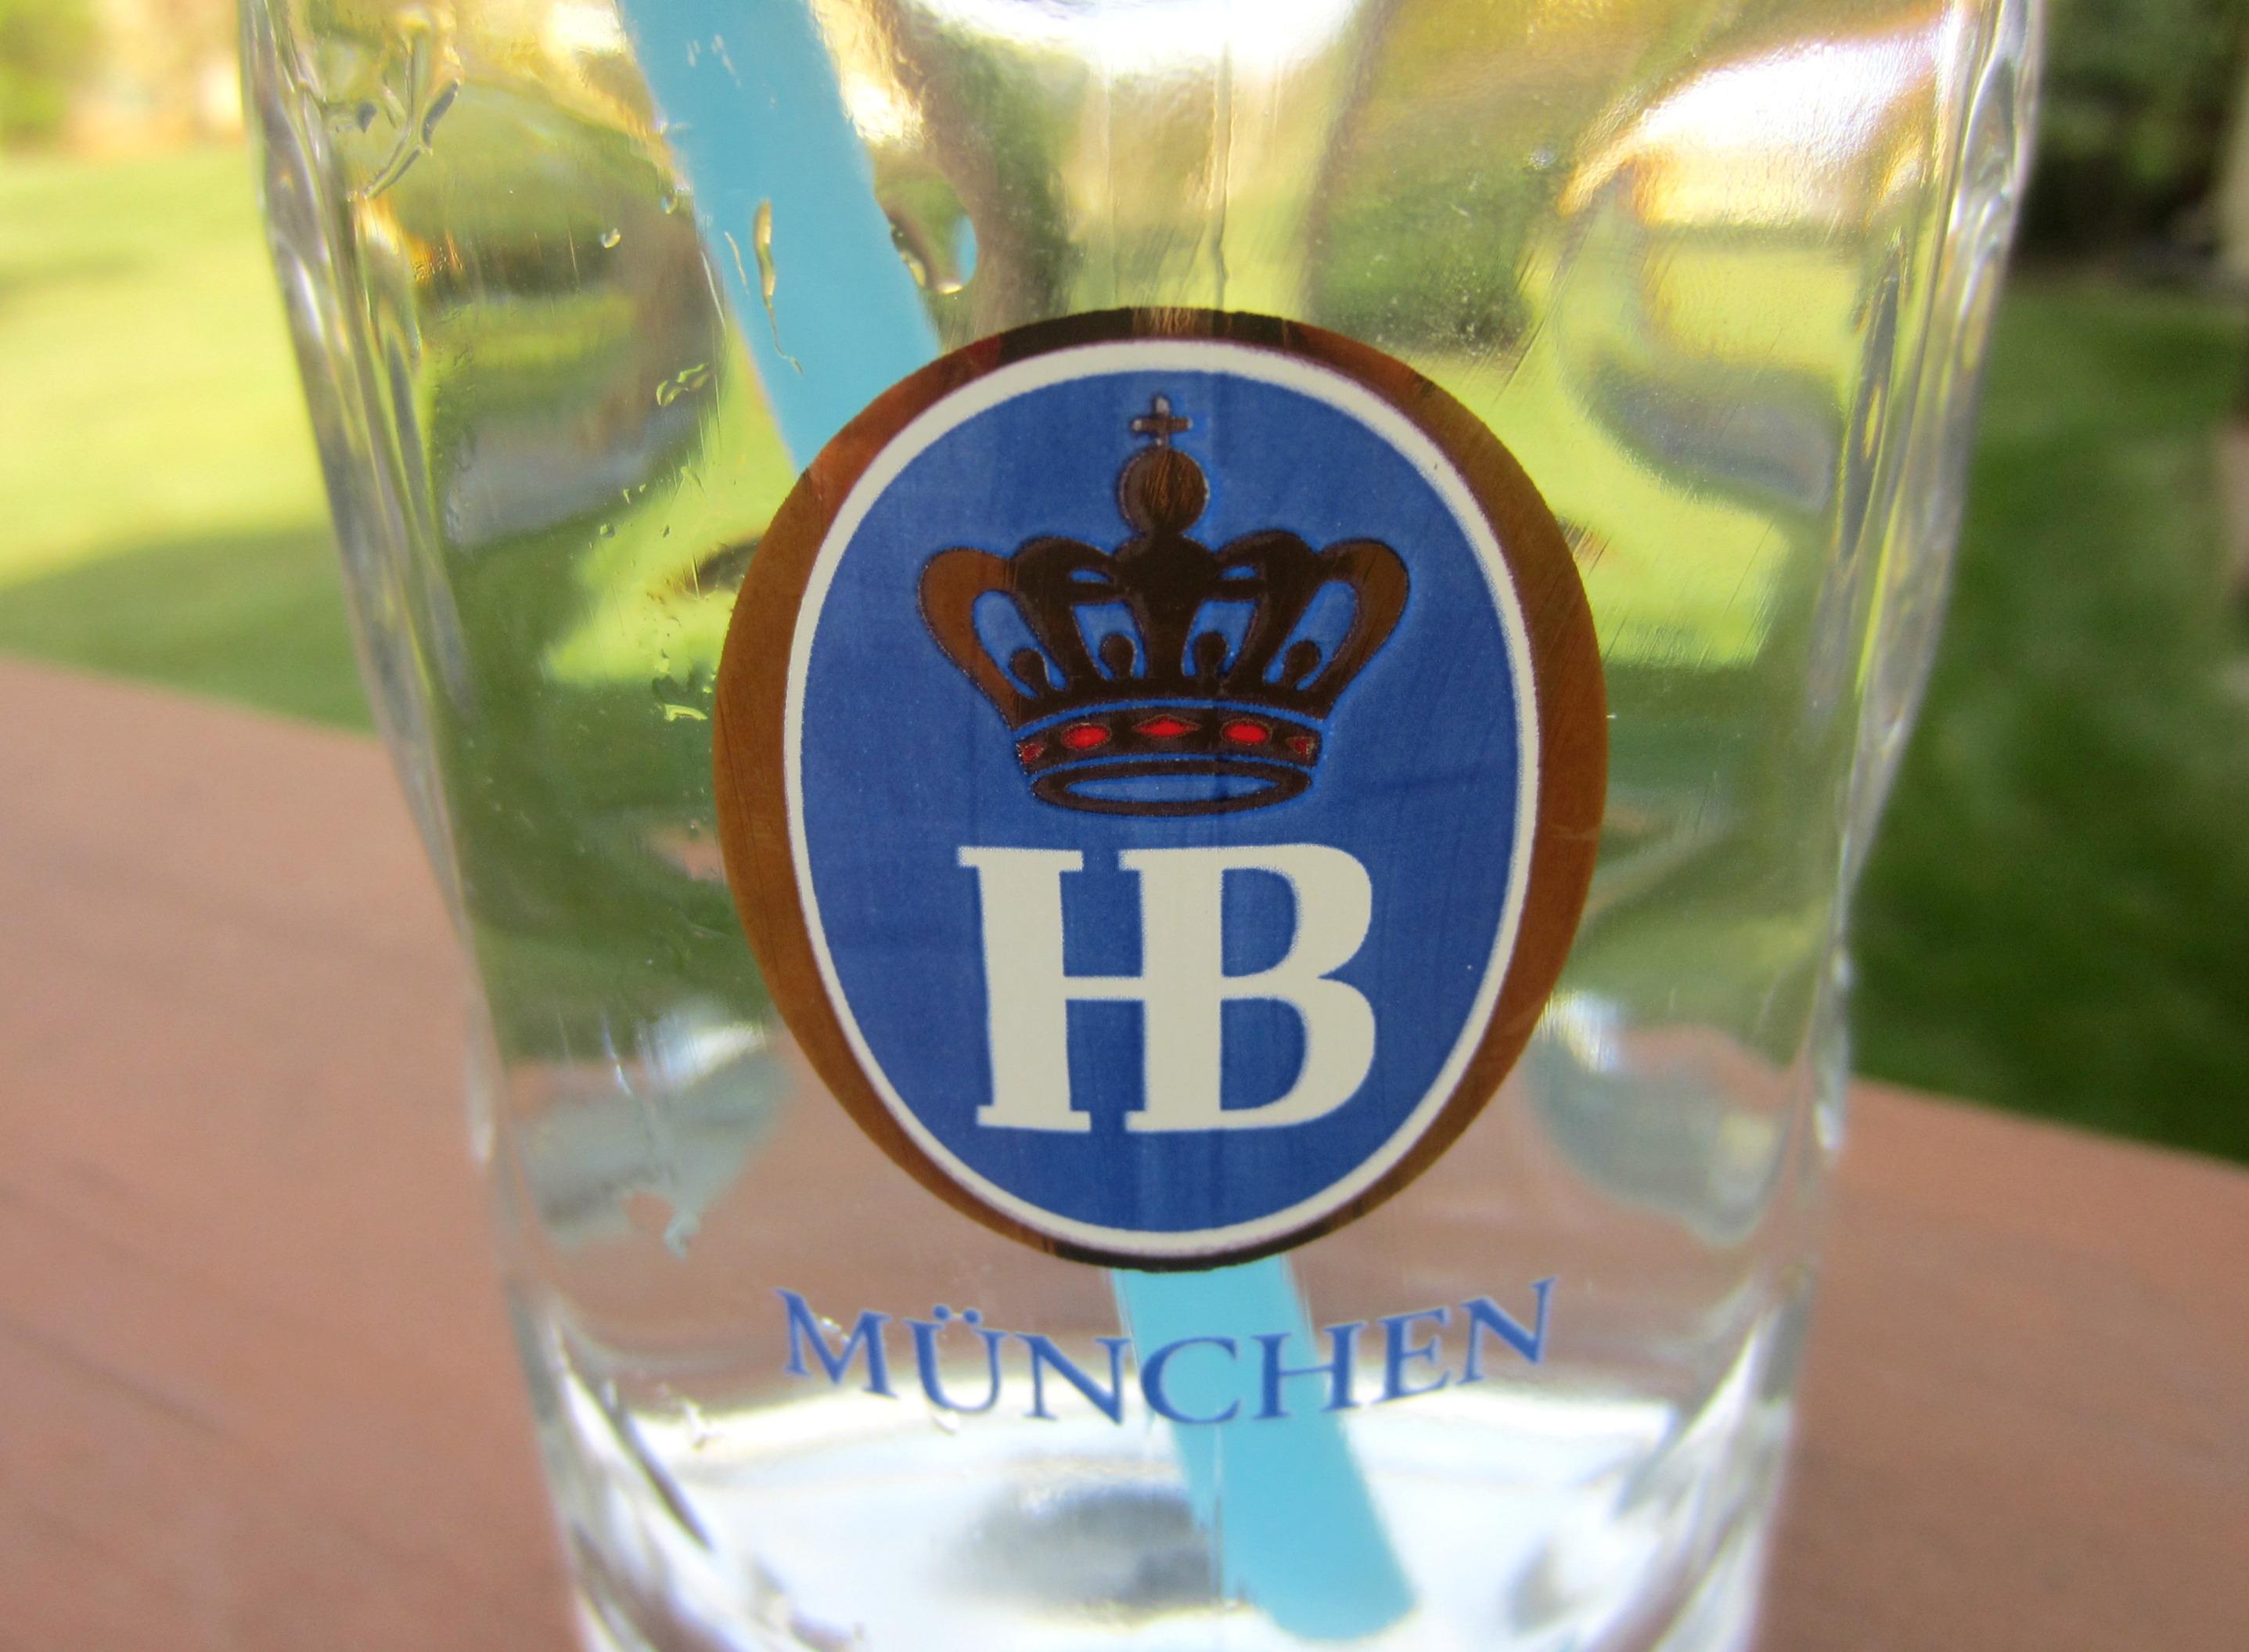 HB Munchen mug